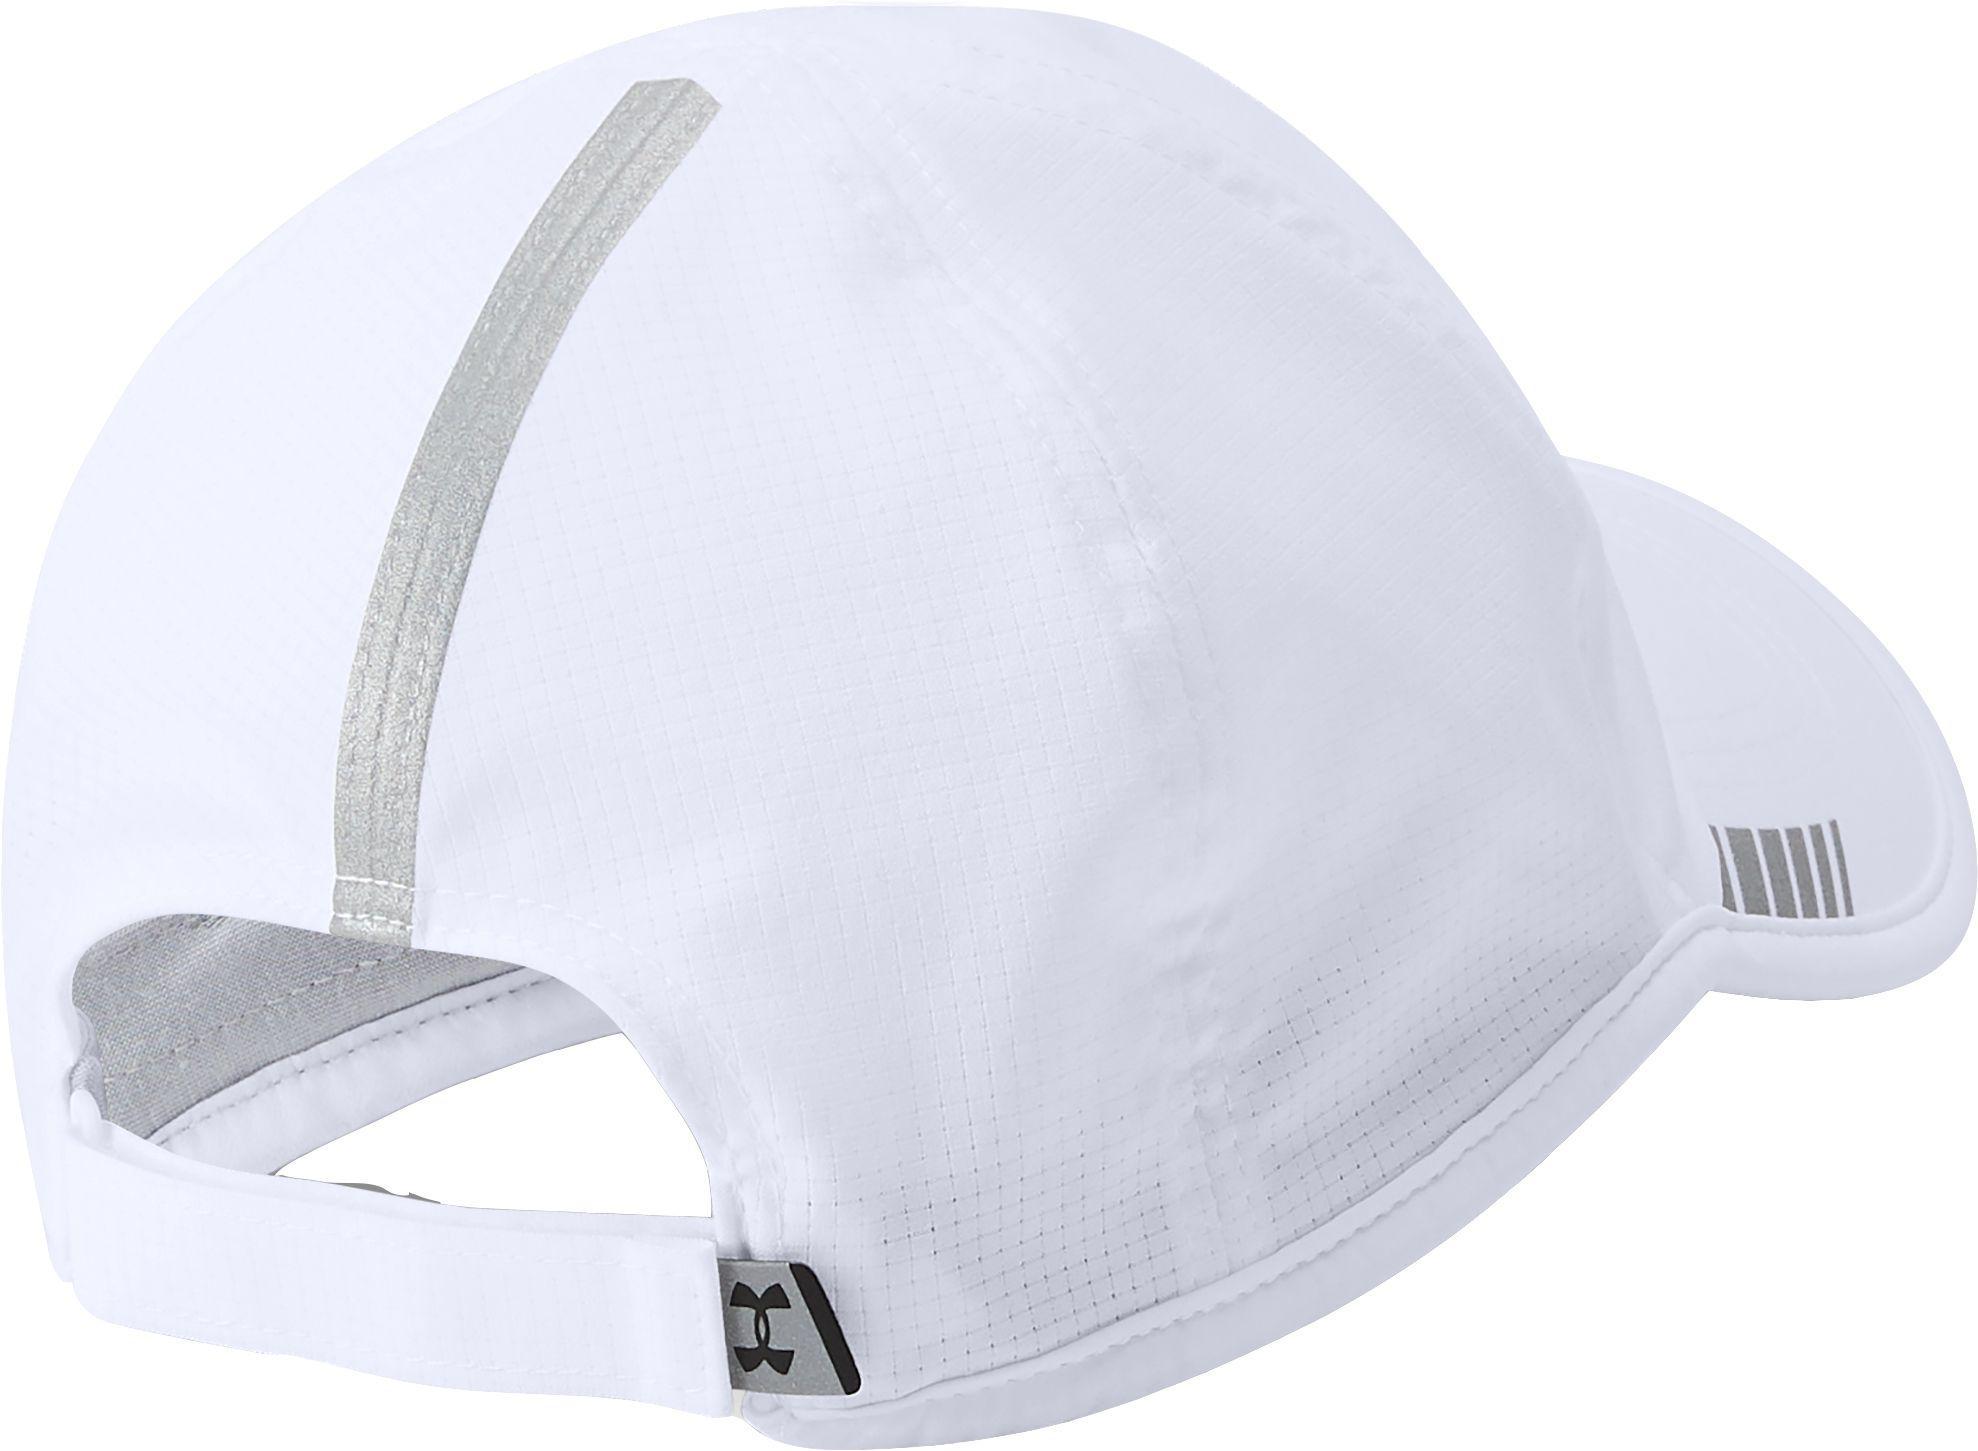 f1983eca7b7 Under Armour - White Launch Armourvent Running Hat for Men - Lyst. View  fullscreen